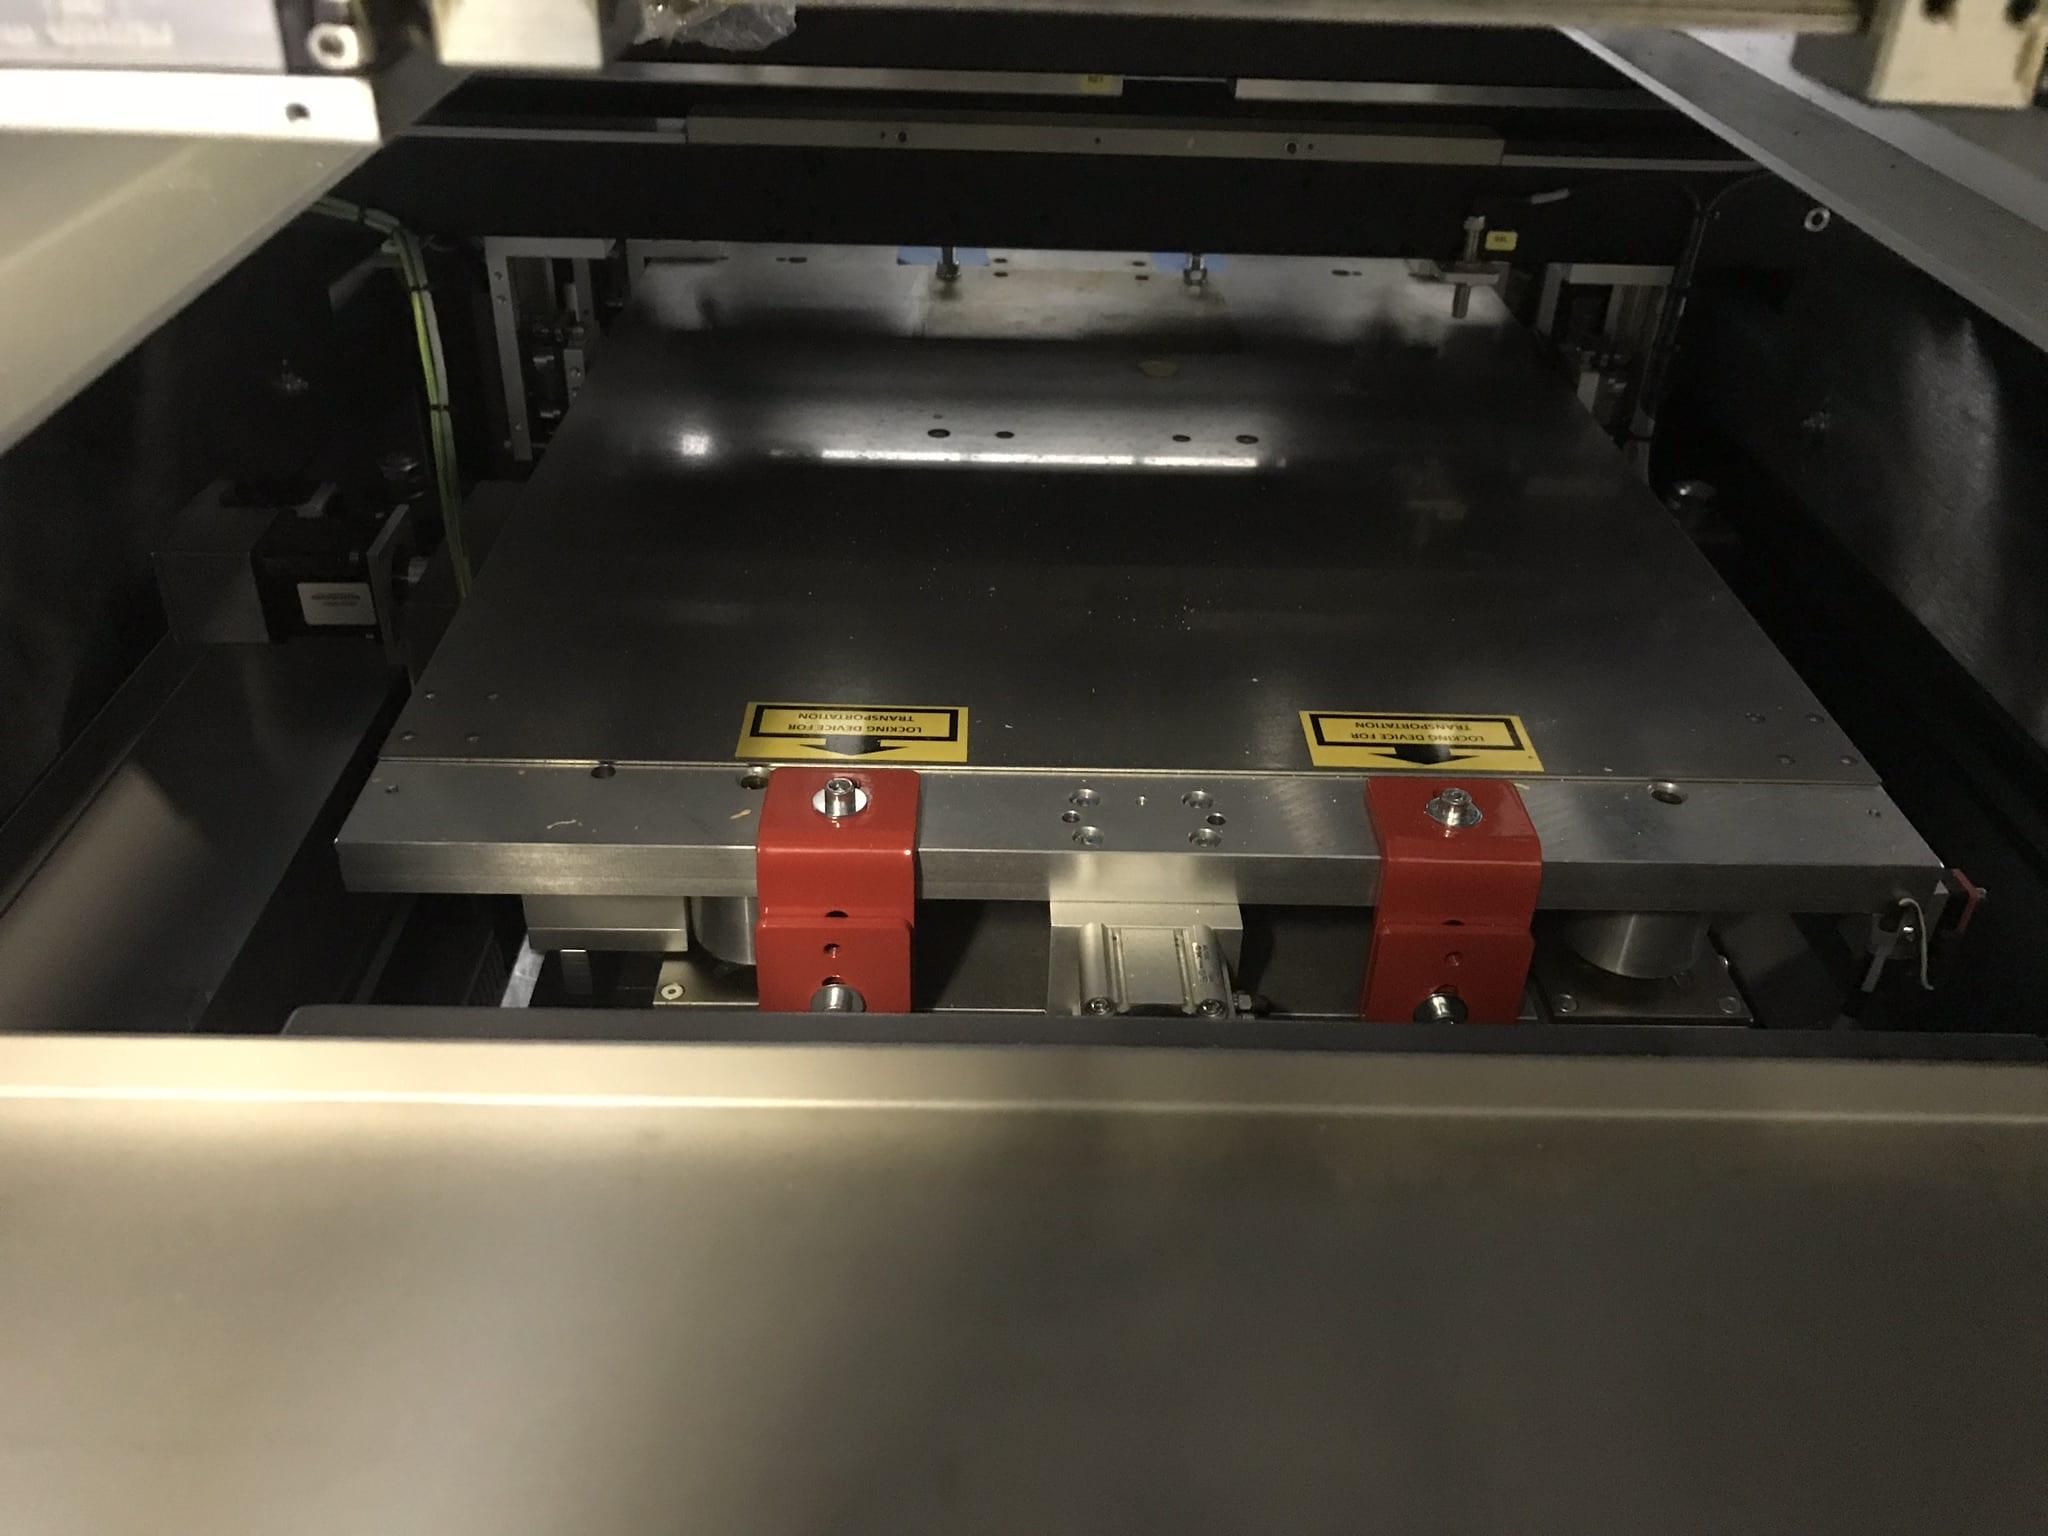 Ekra-XACT X 4-Screen Printer-41392 Image 3